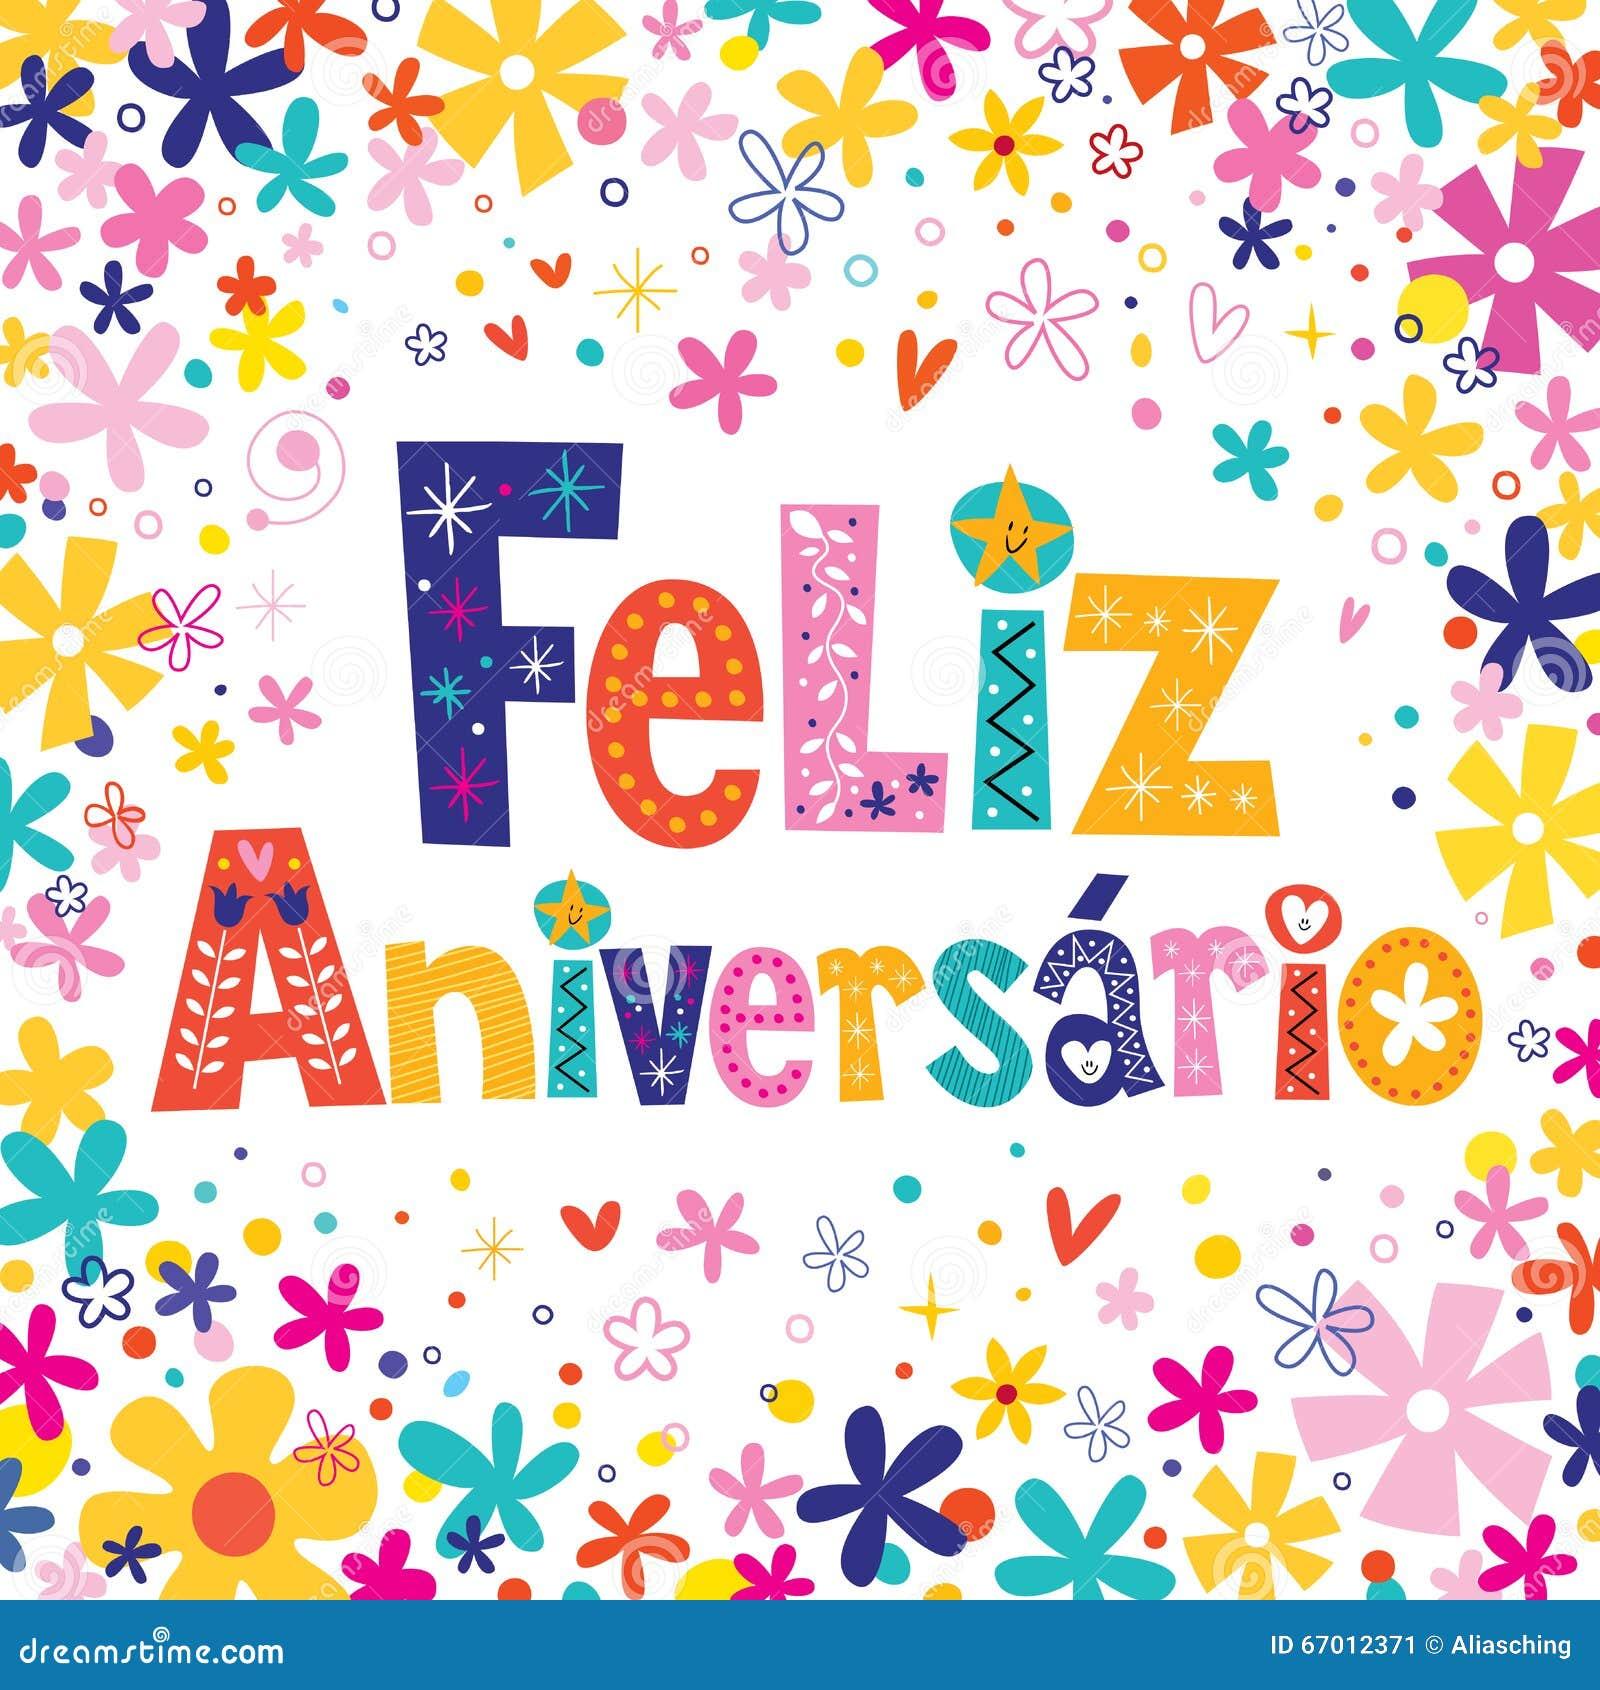 Feliz Aniversario Portuguese Happy Birthday Card Royalty Free Illustration